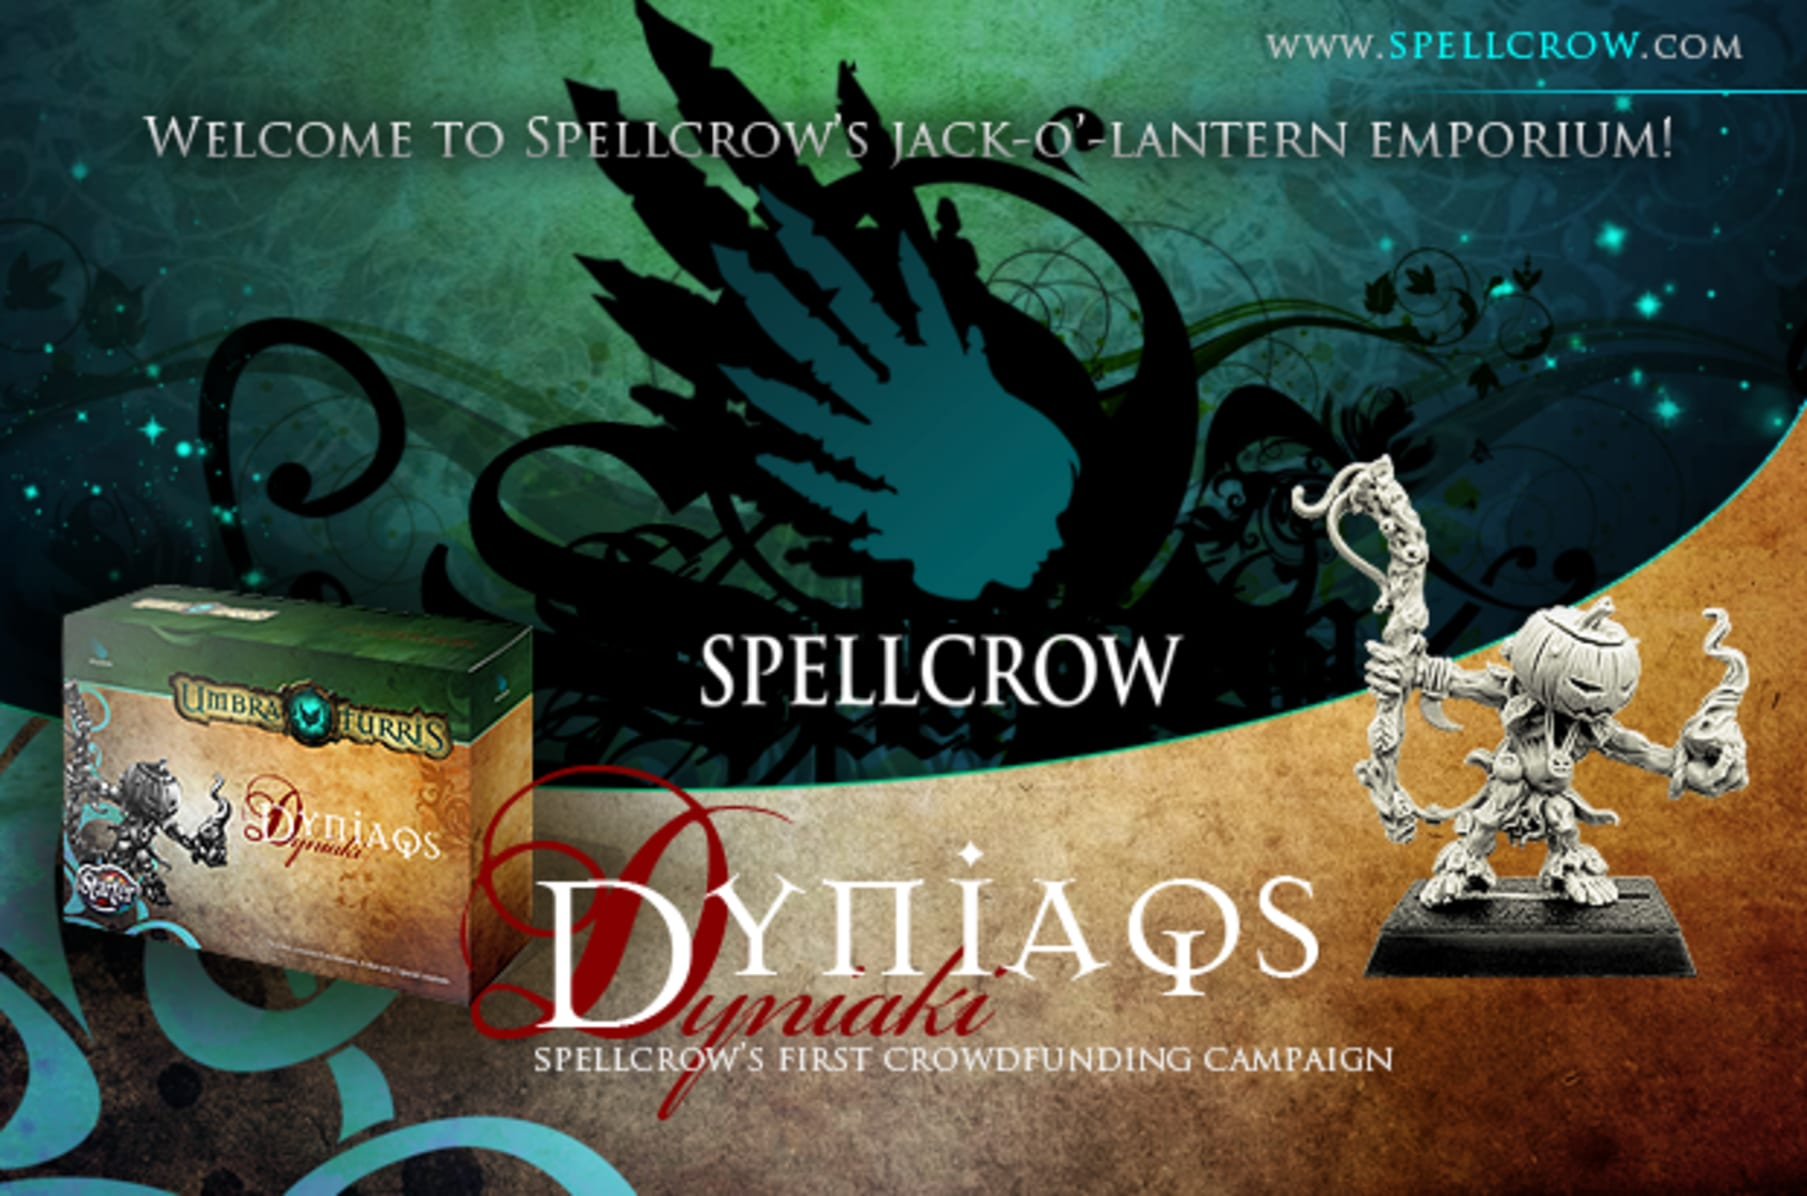 Pumpkinhead Mage Spellcrow SPCH1709 Dyniaq with Dagger Umbra Turris Resin